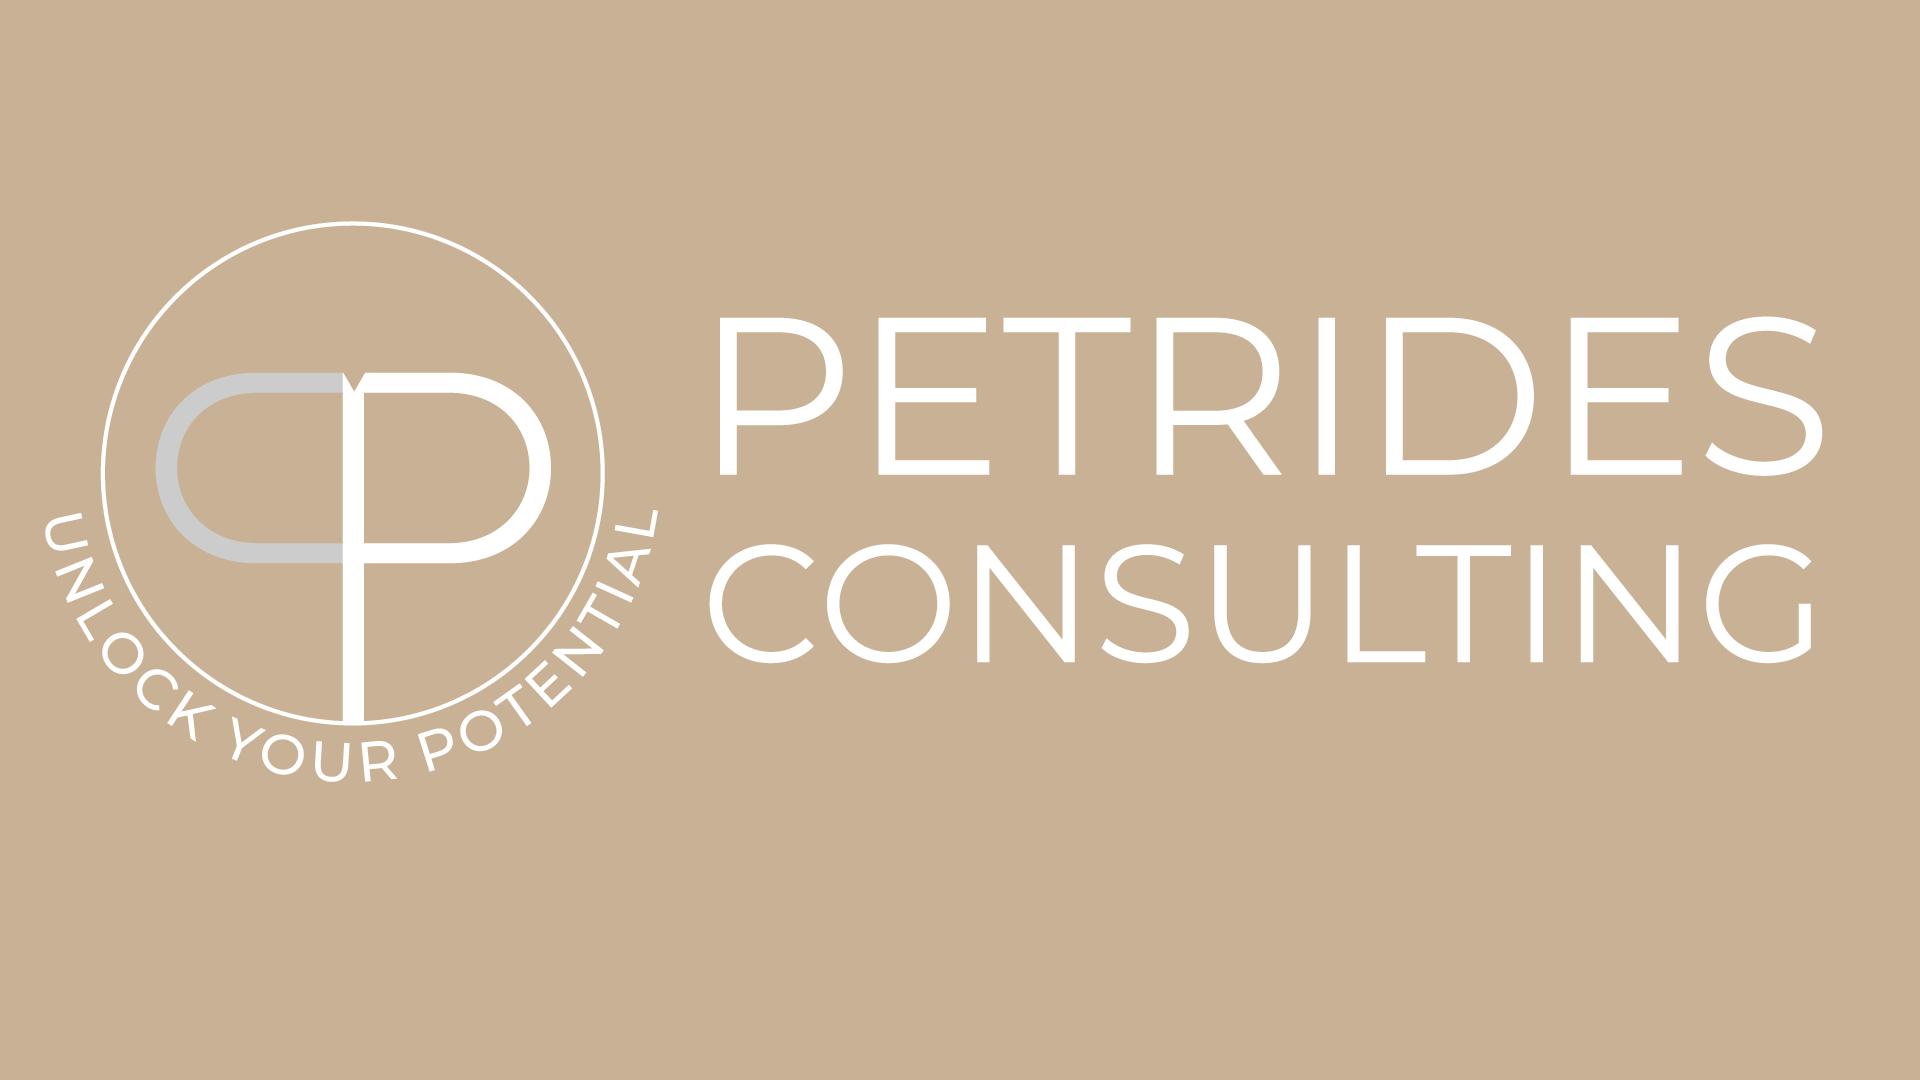 Petrides Consulting